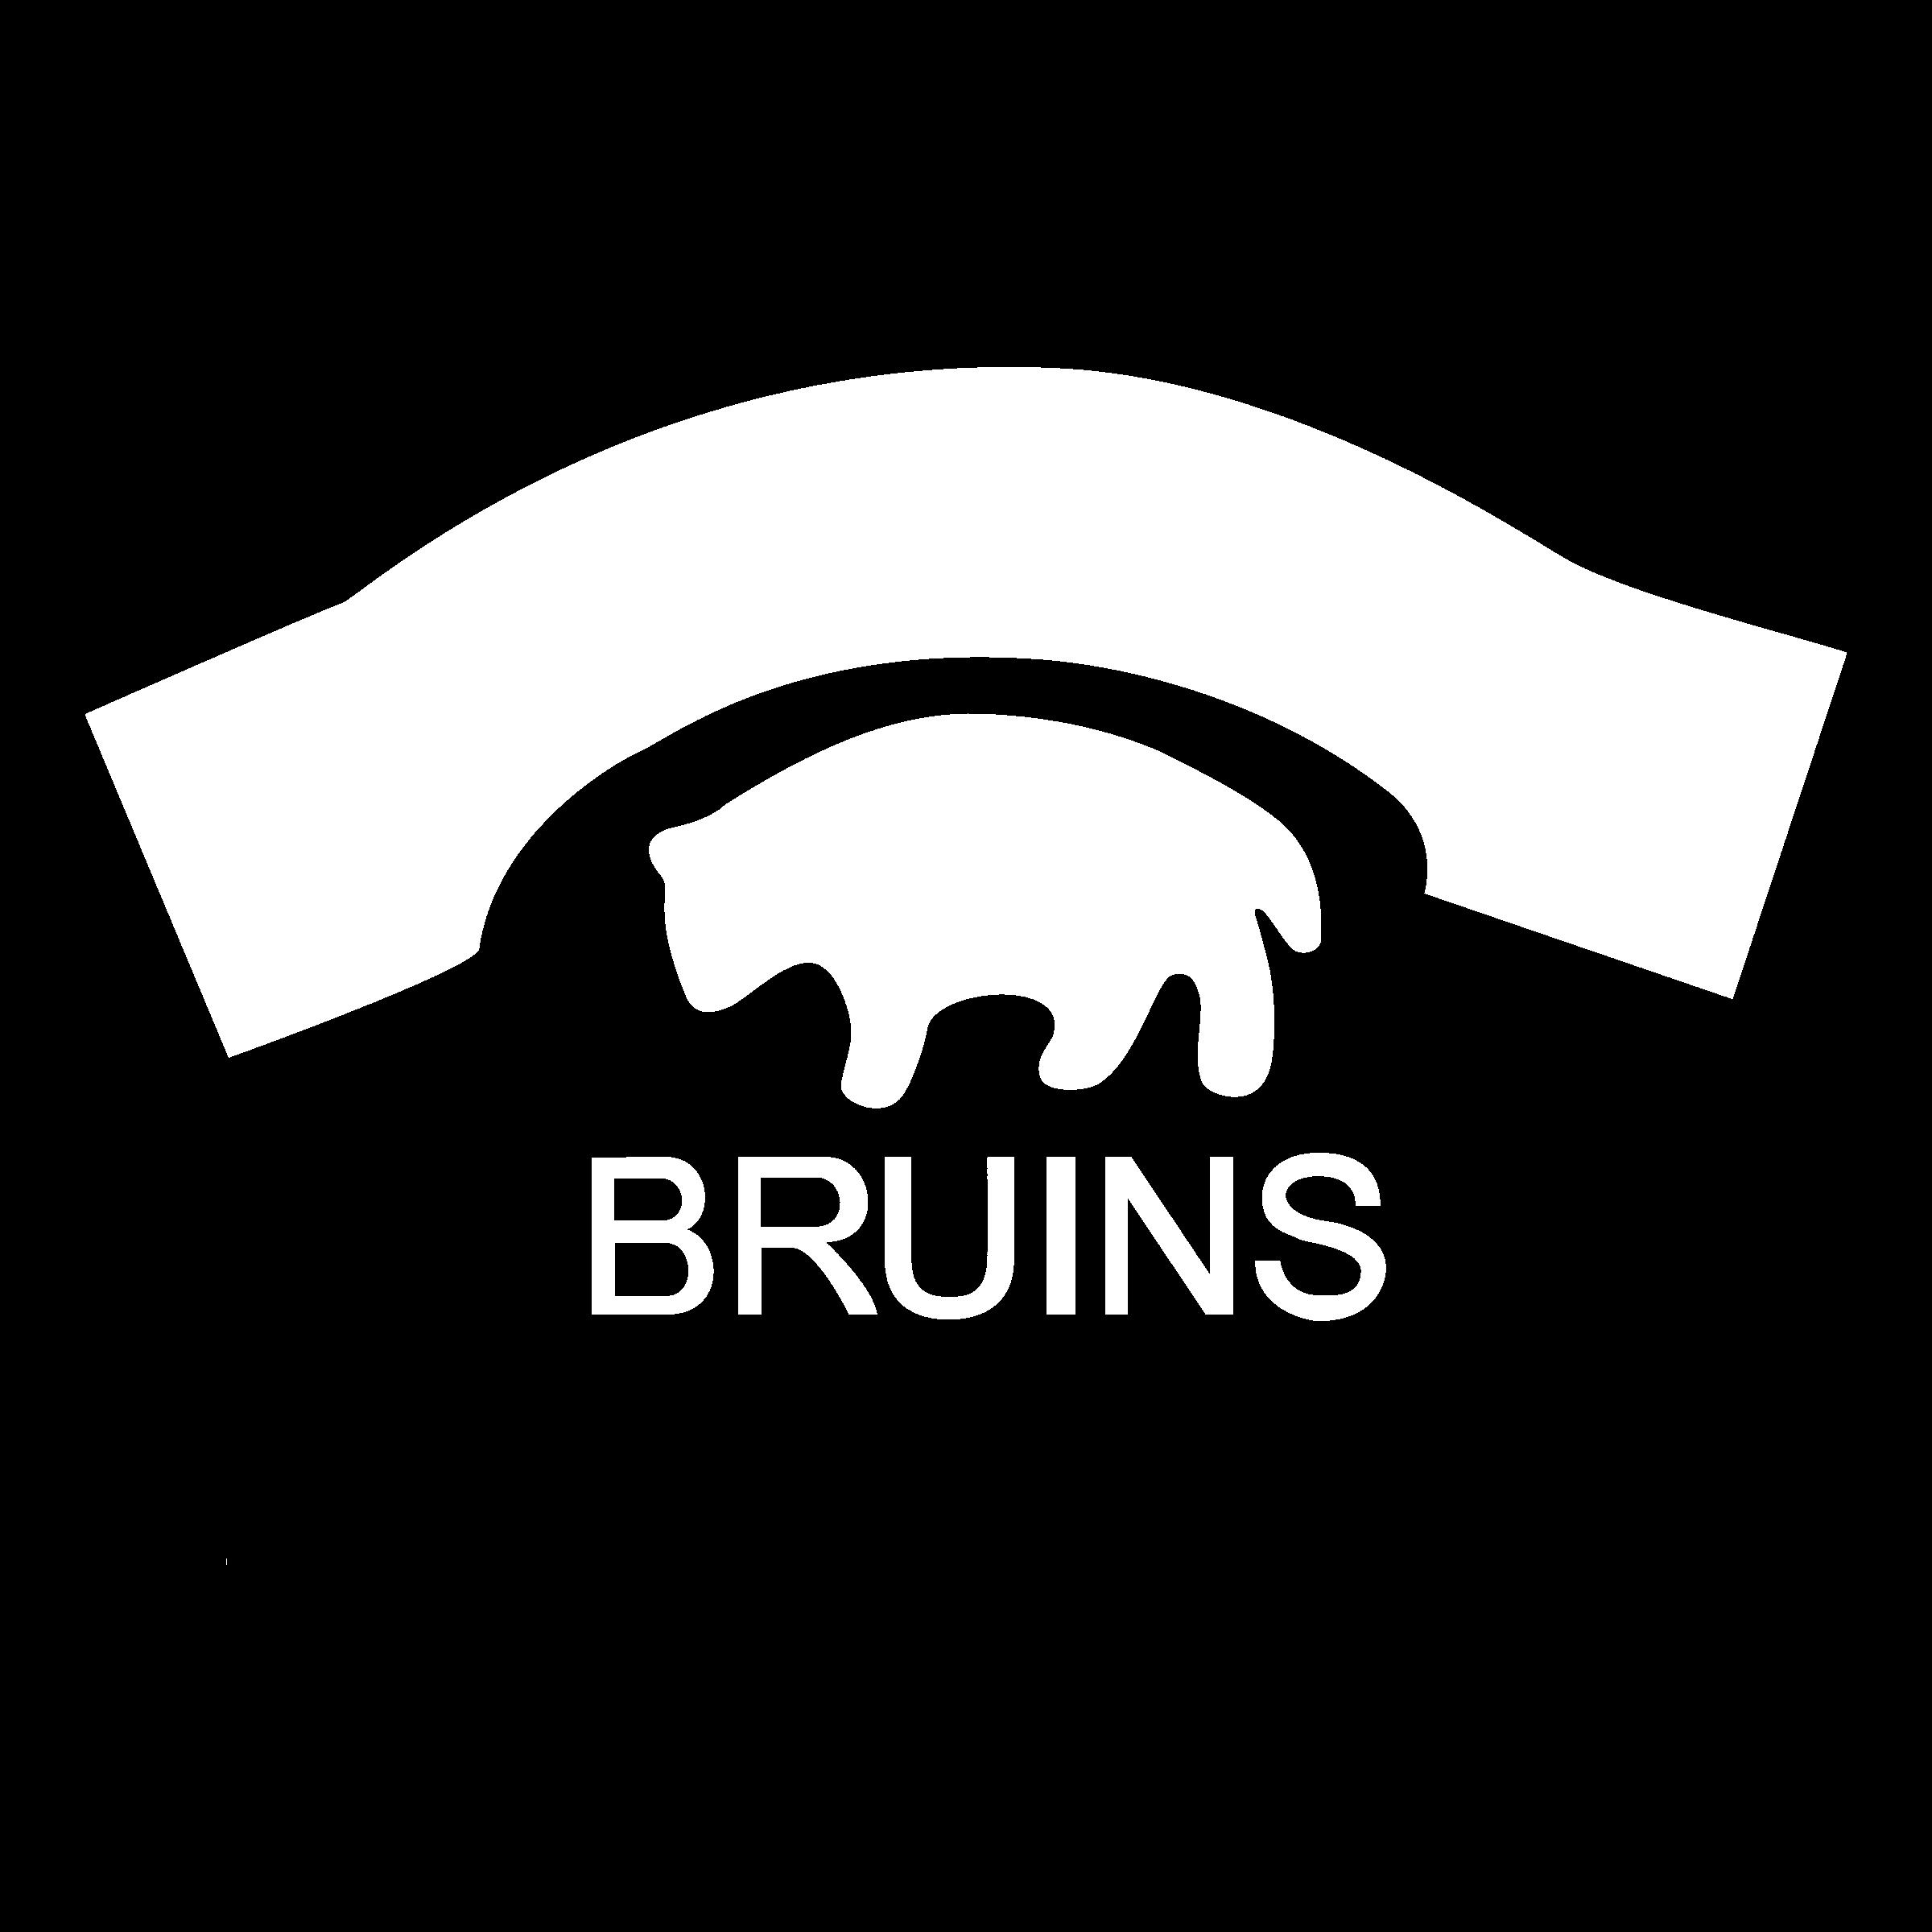 Contemporary Boston Bruins Logo Template Picture Collection ...